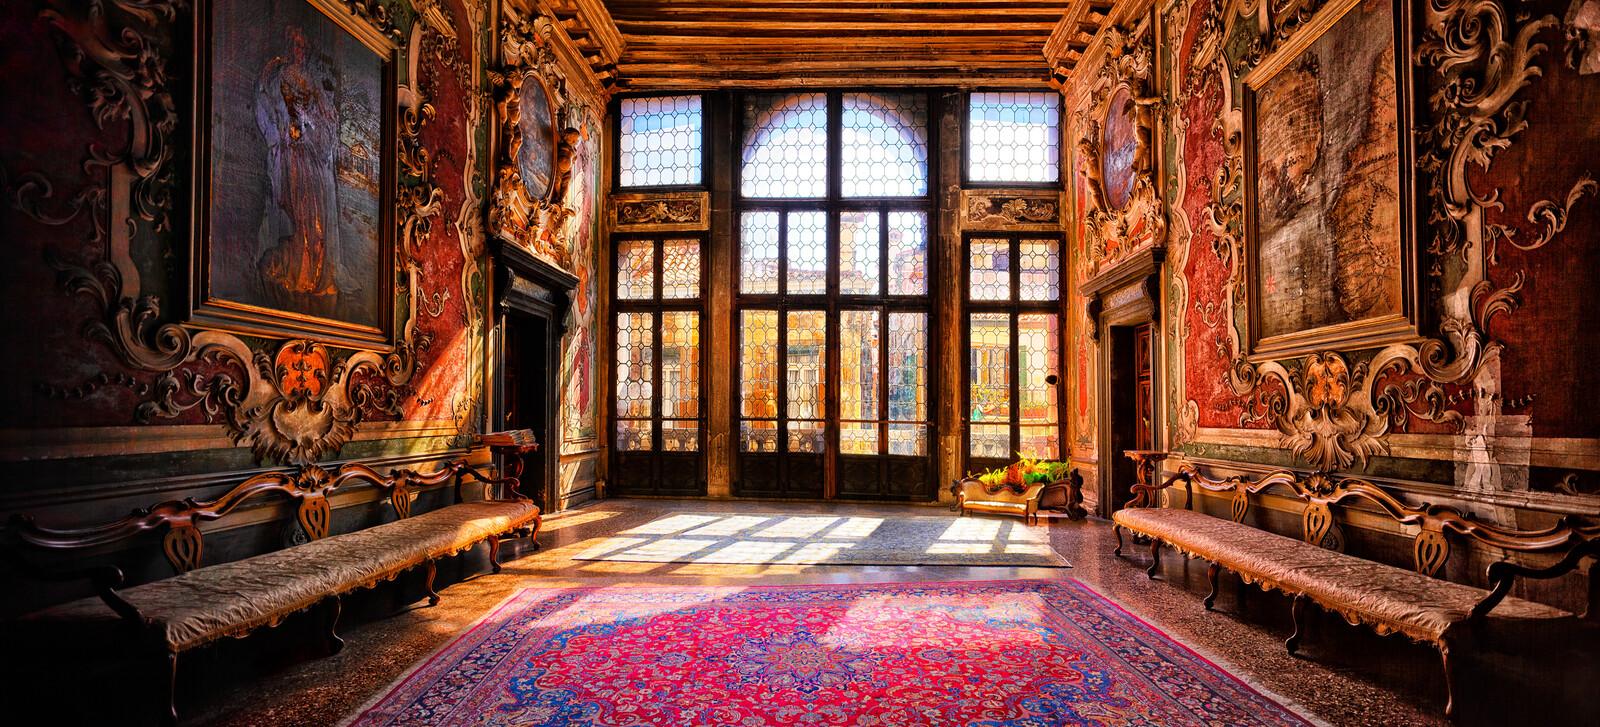 Palazzo di Alvise VII - Werner Pawlok